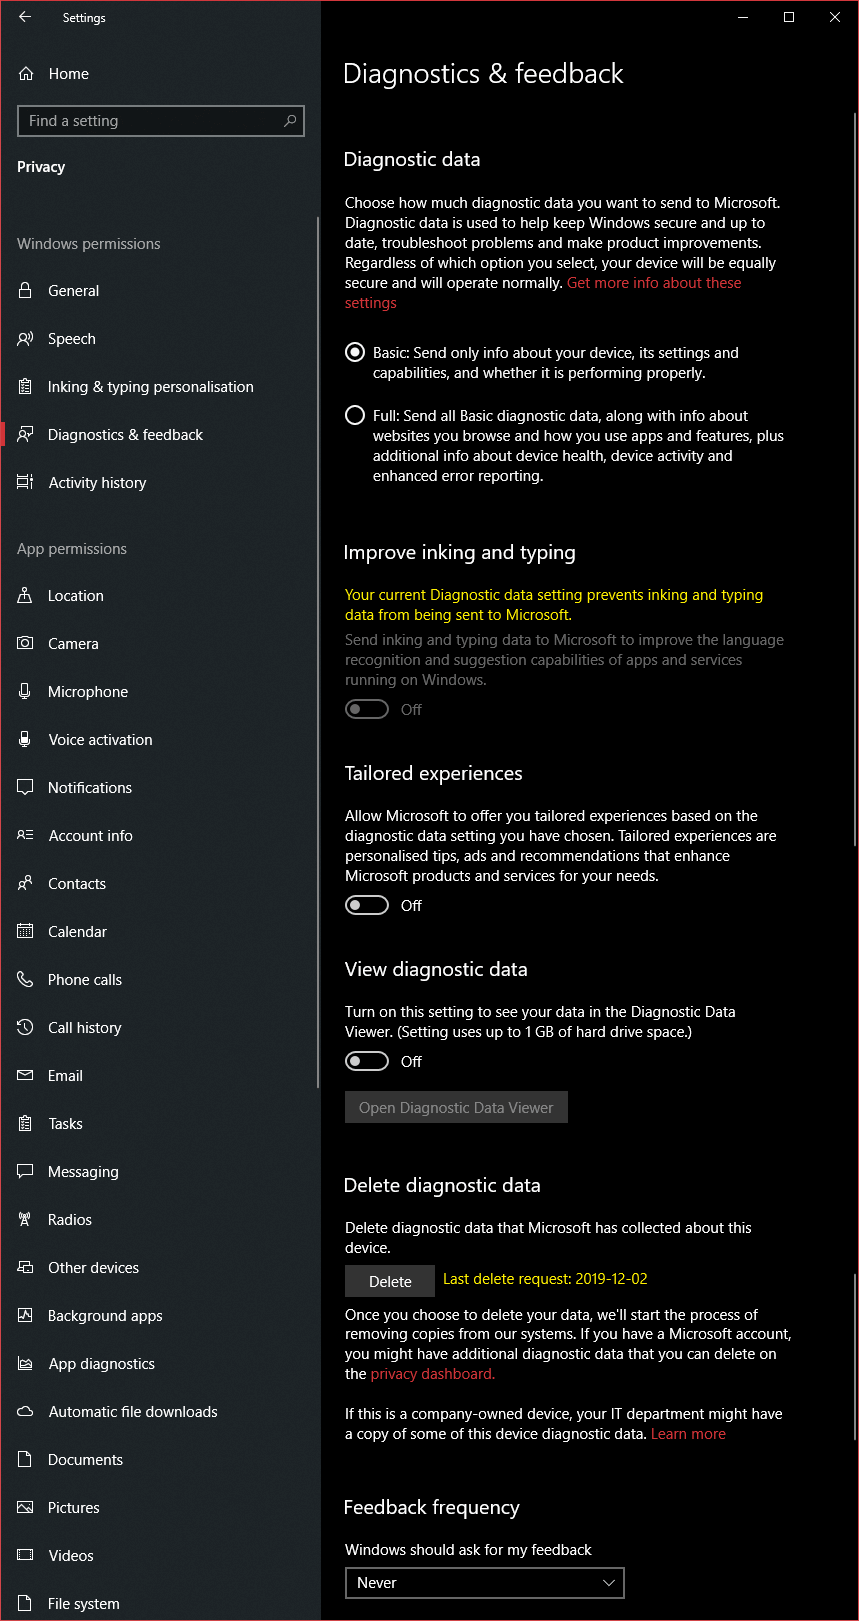 Diagnostics privacy settings